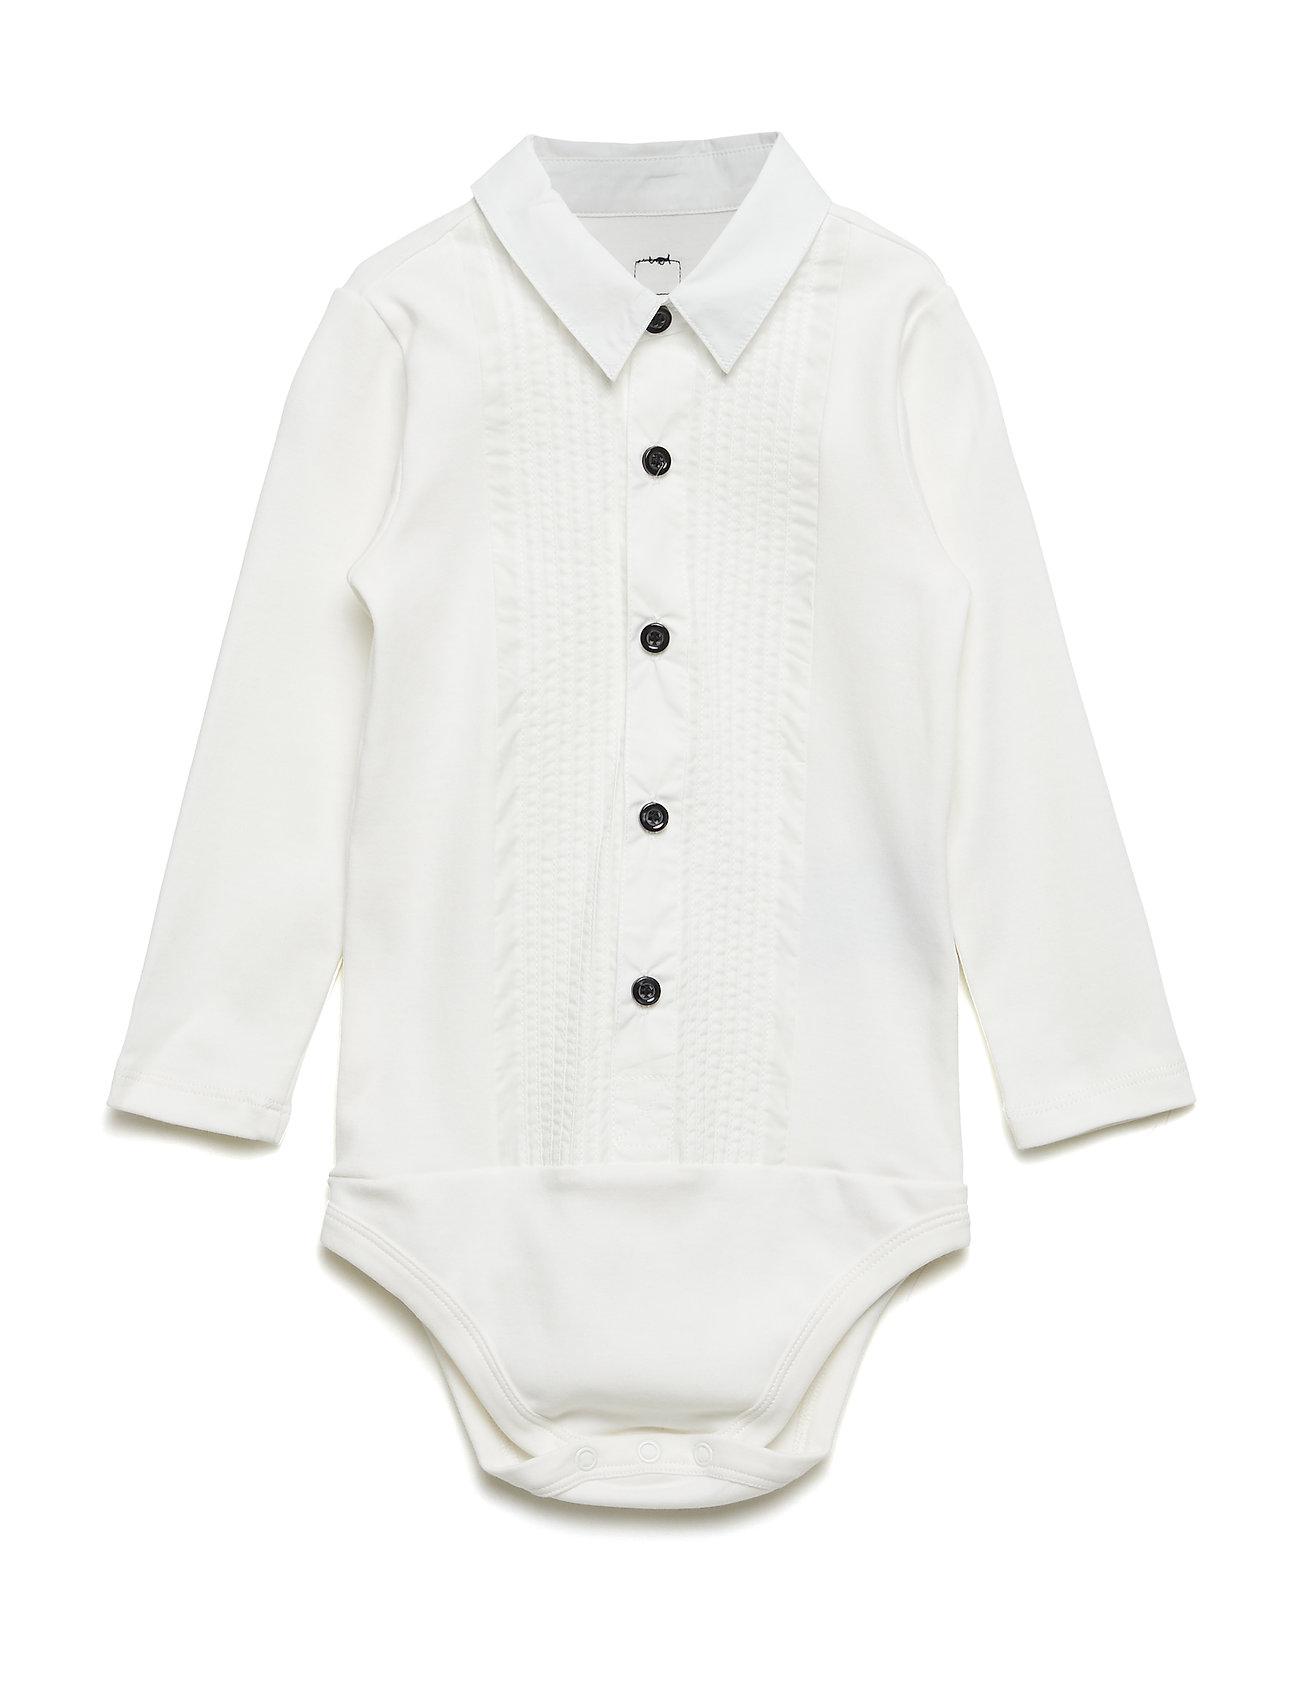 The Tiny Body/Tuxedo The Tiny Universe Langærmede bodies til Børn i Off-White